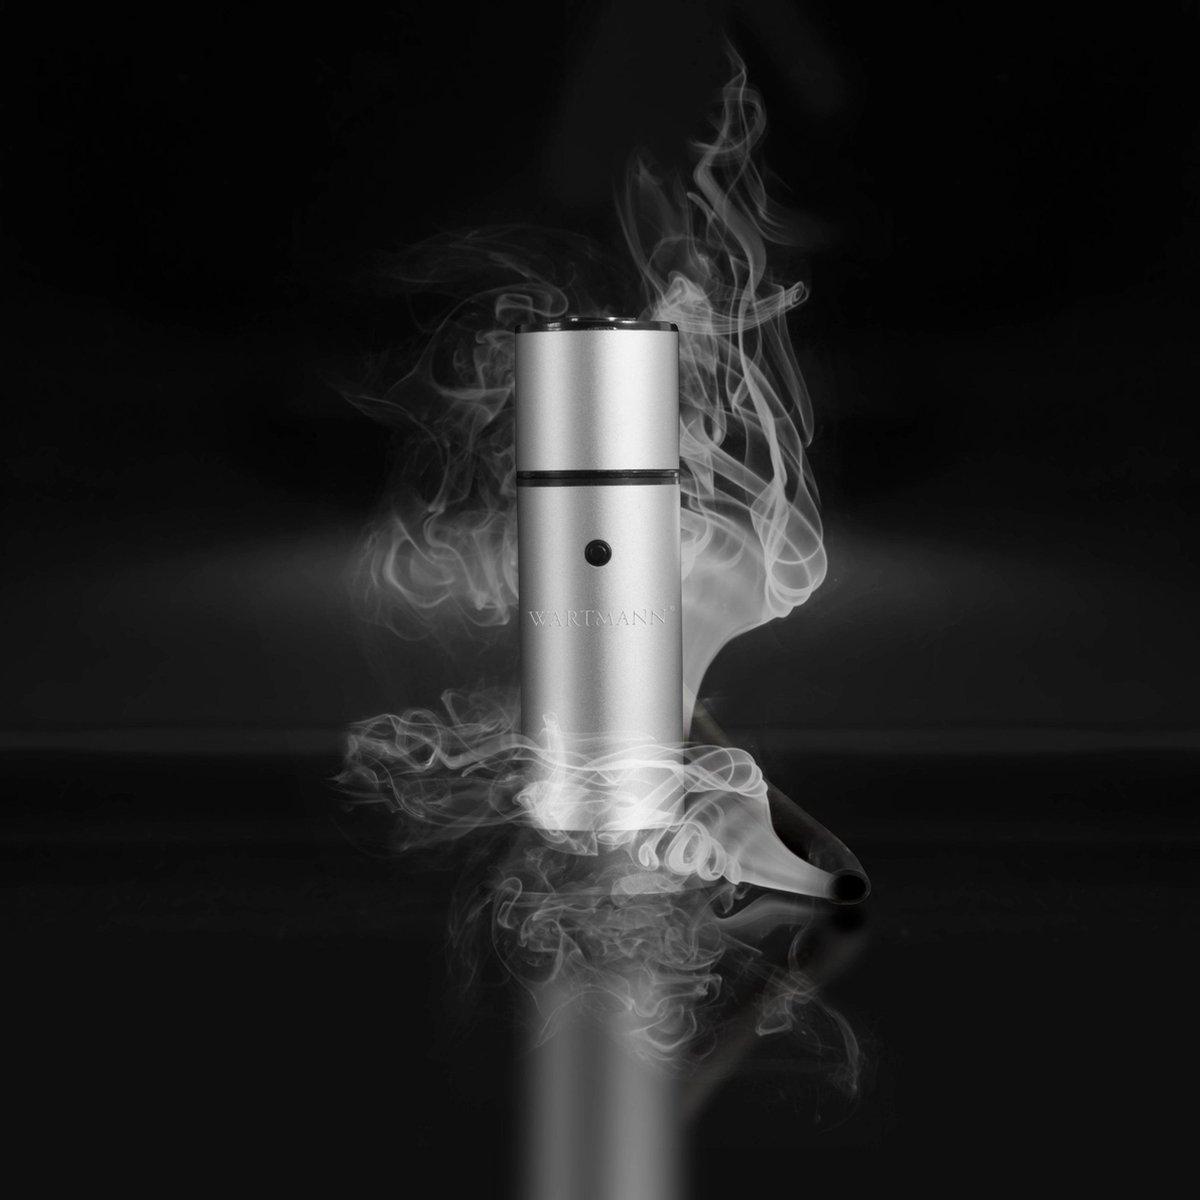 Wartmann WM-1602 SMK Foodsmoker - Koud roken - Werkt op twee AA batterijen